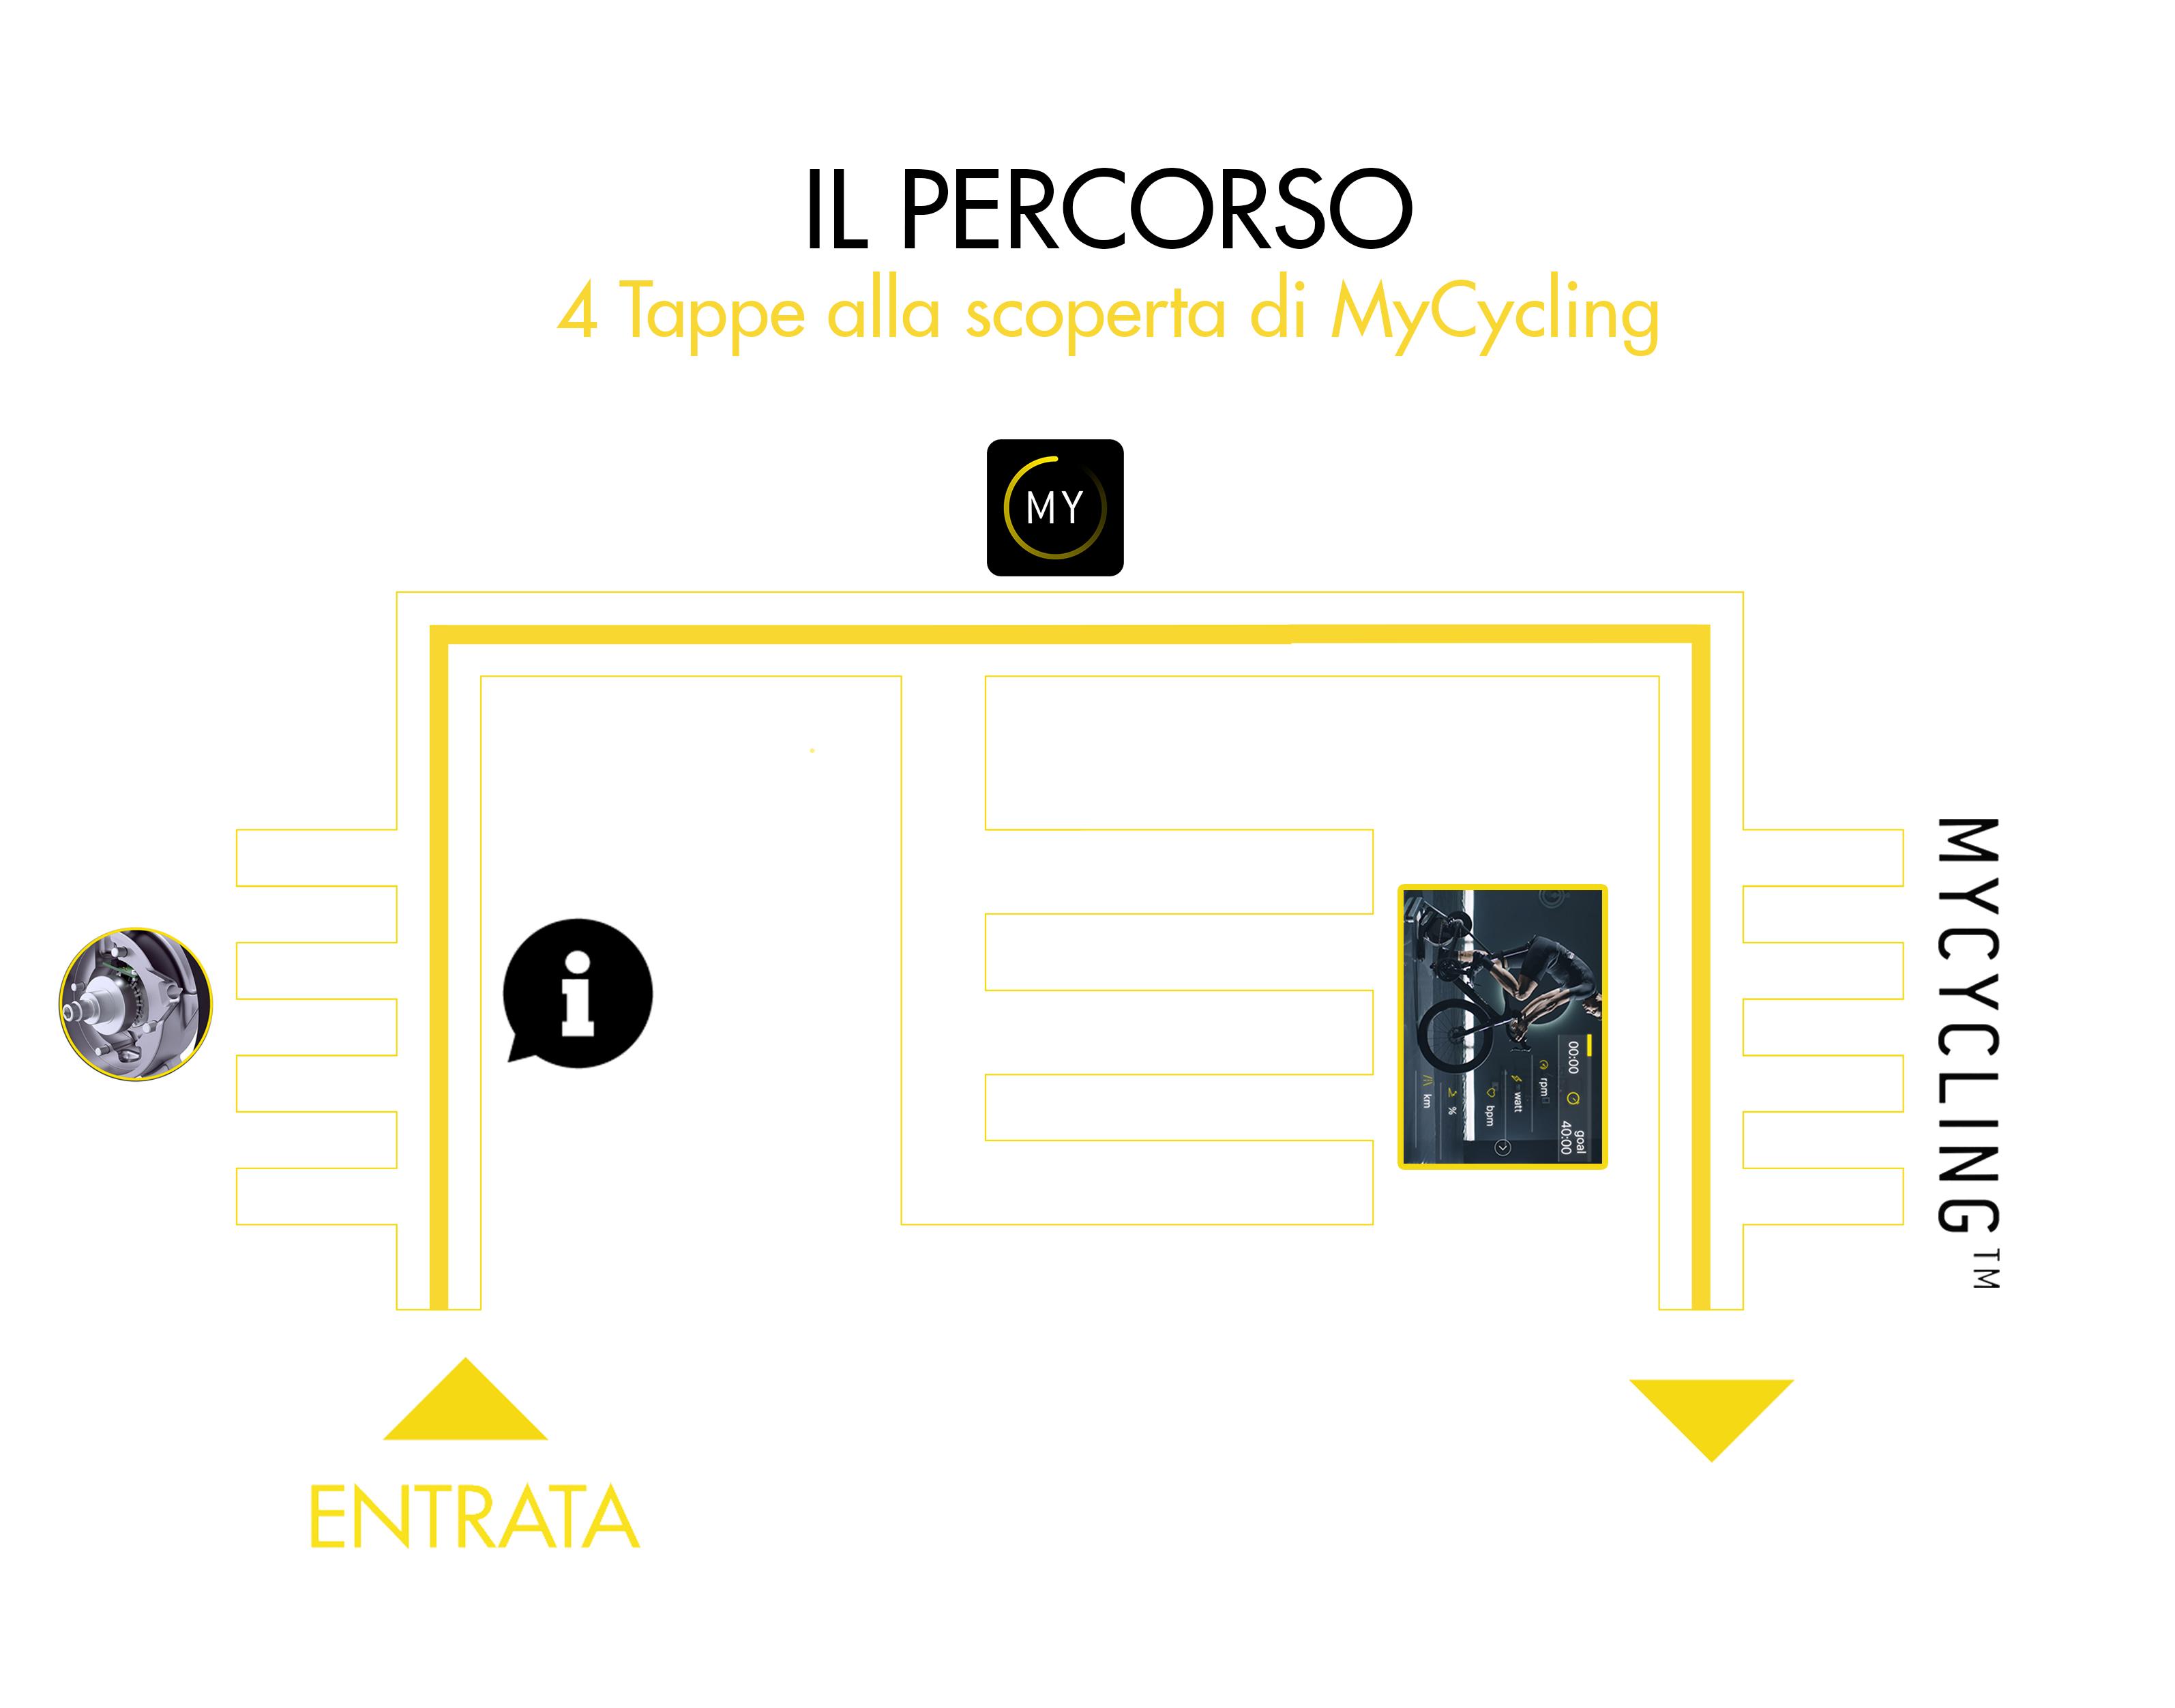 C:UsersDesignByGeminiGoogle DriveProgettiTechnoGymNewpian